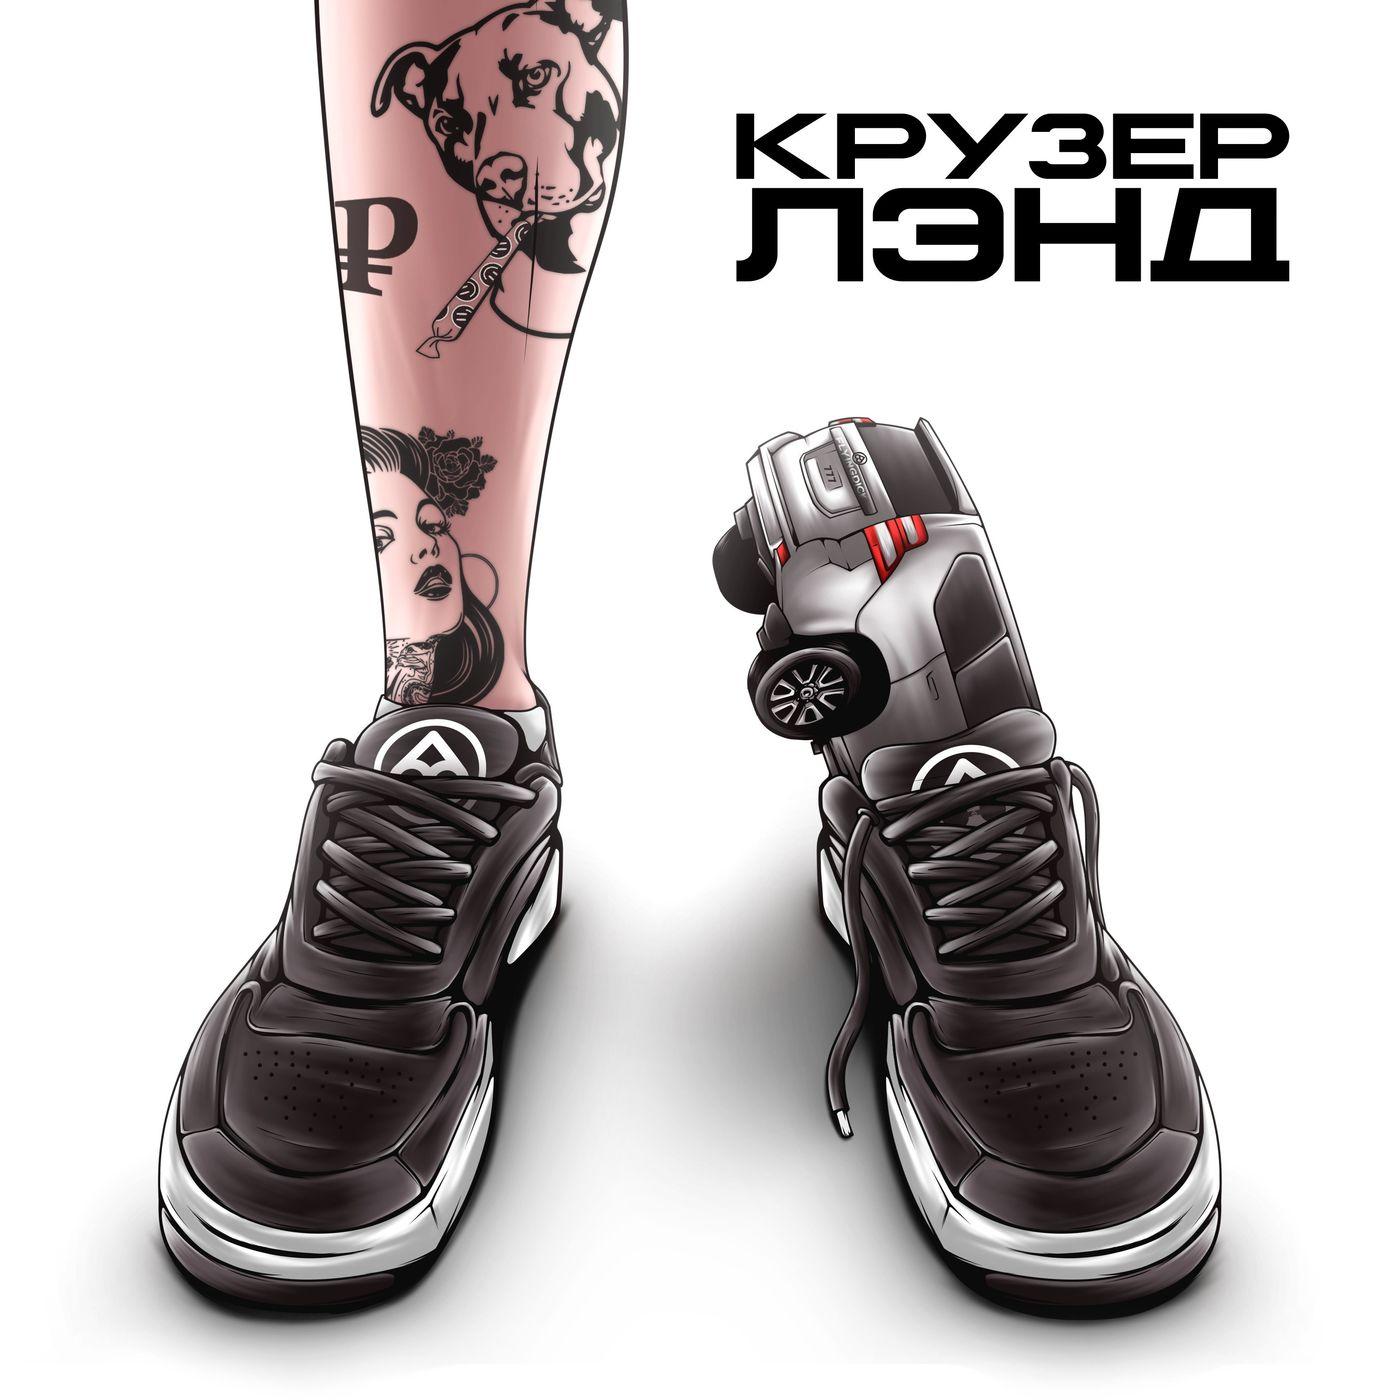 FLYINGDICK - Крузер Лэнд [single] (2020)